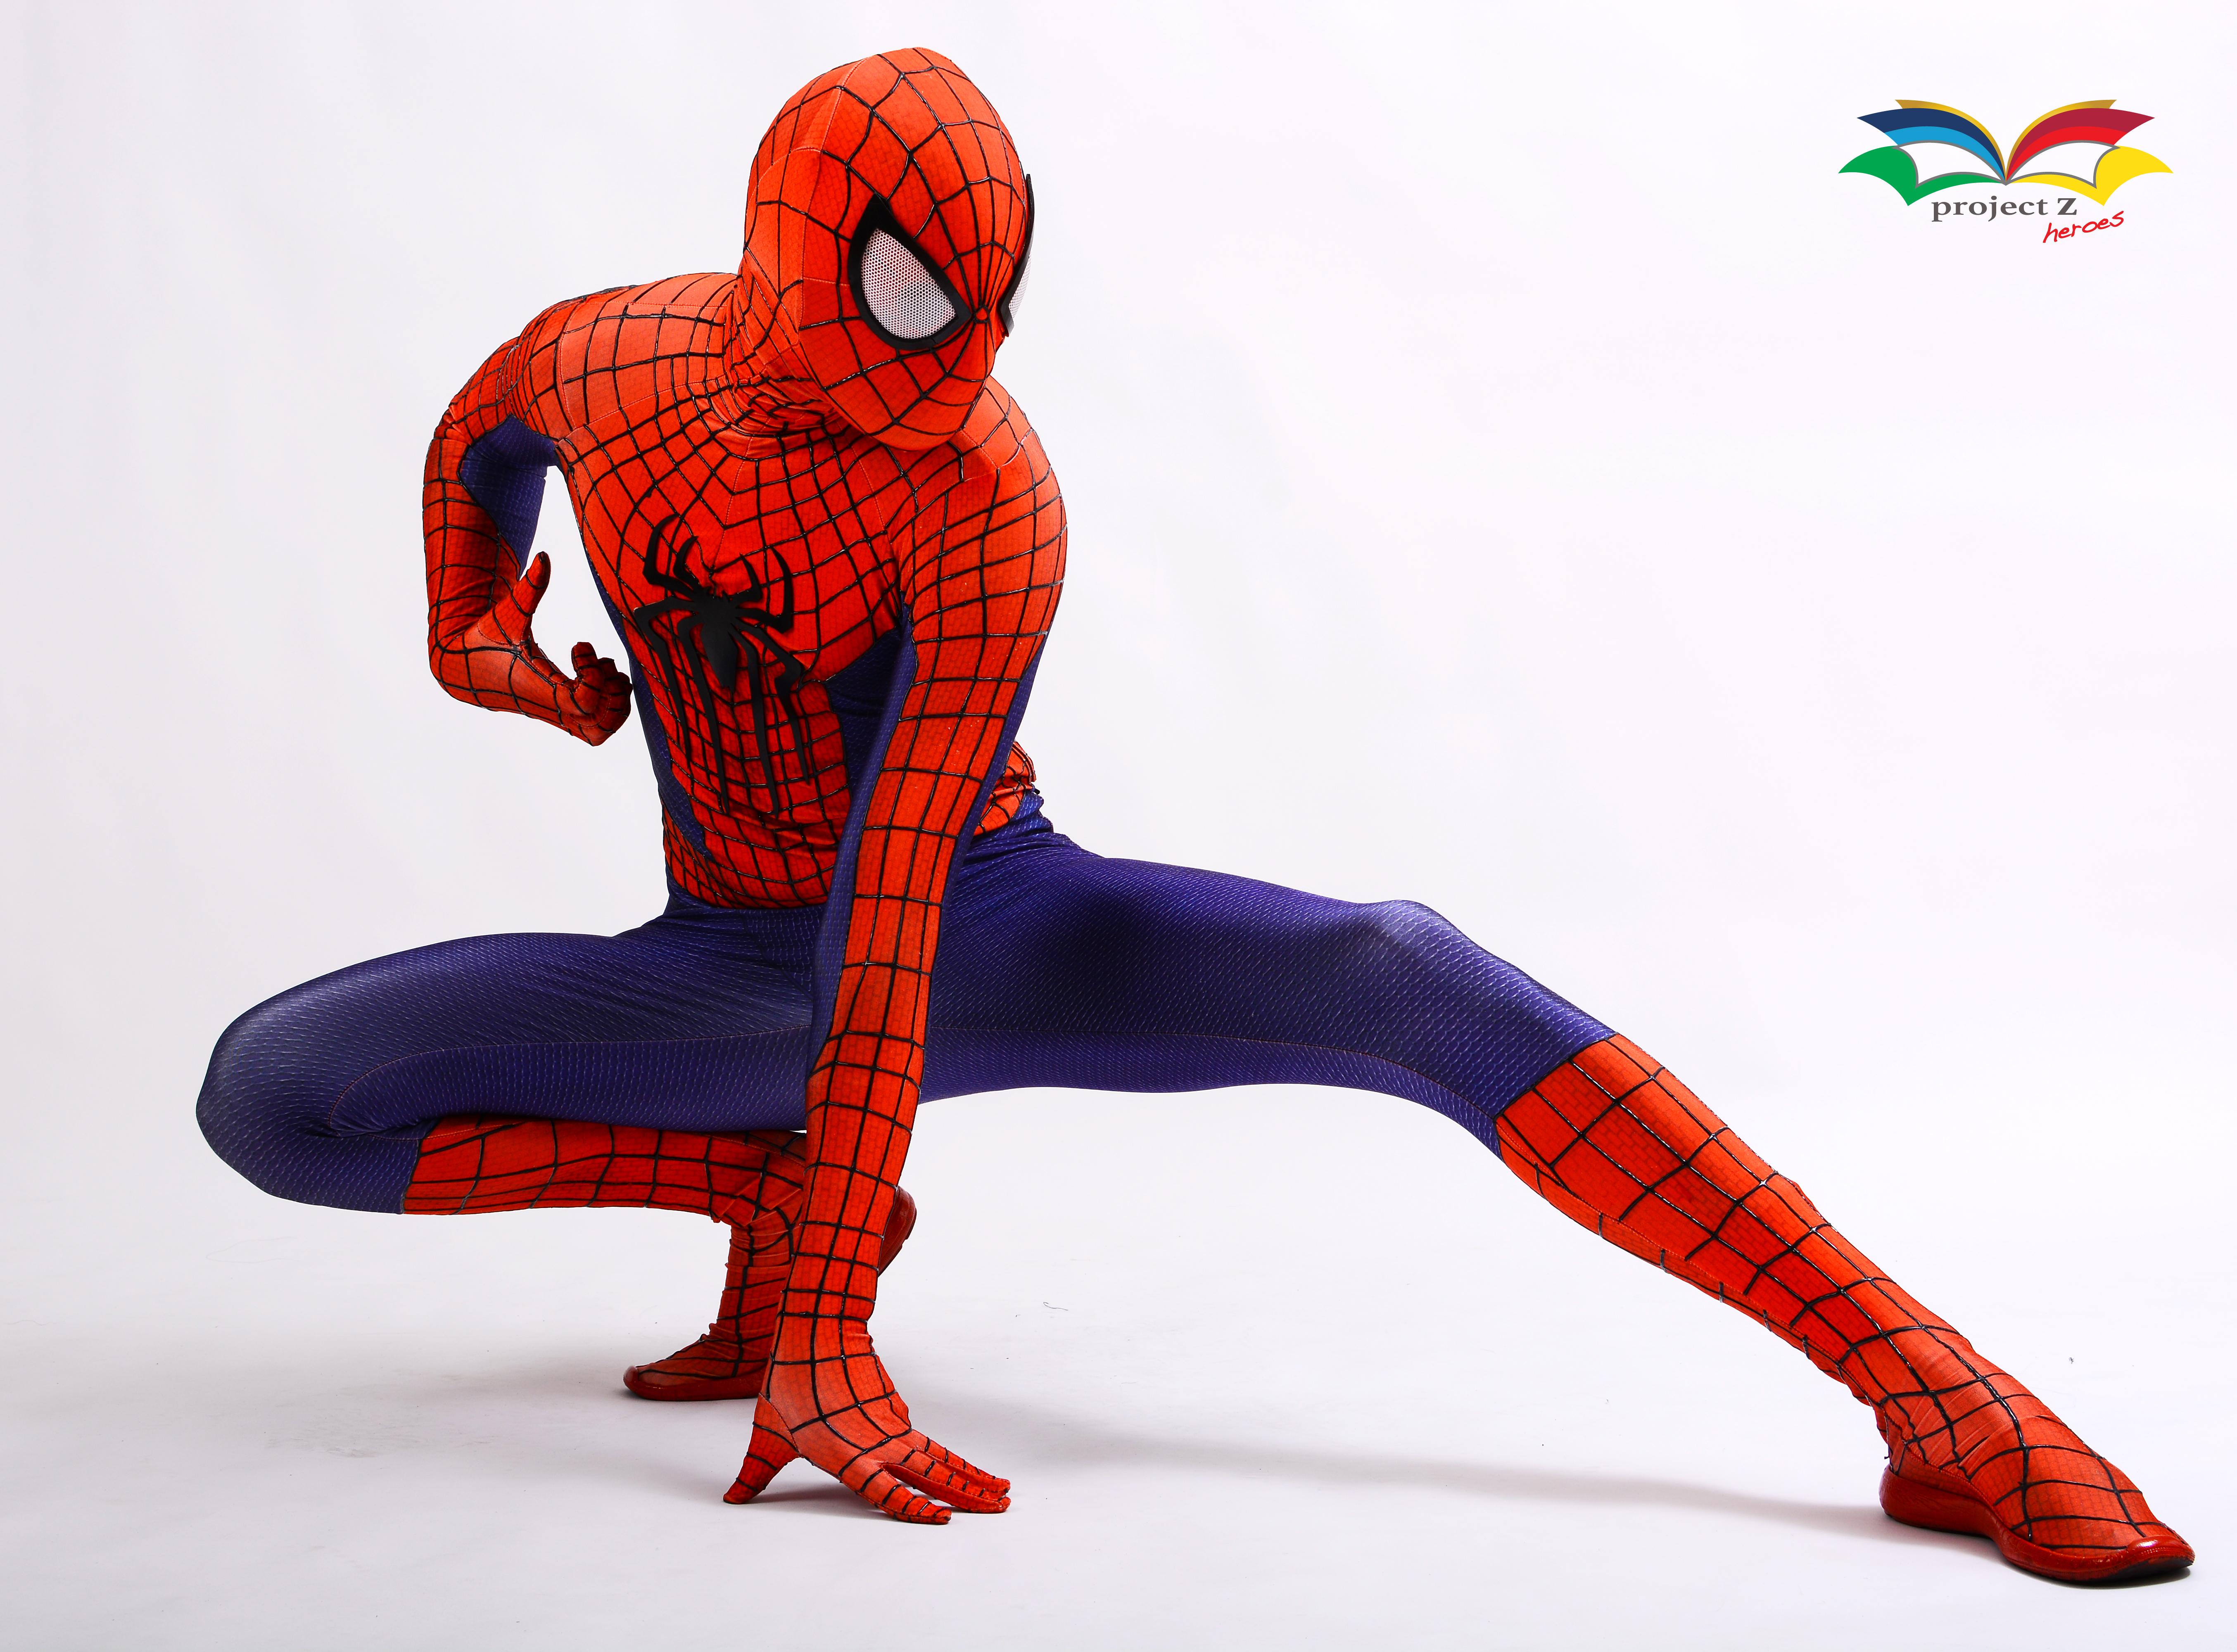 Spiderman costume post